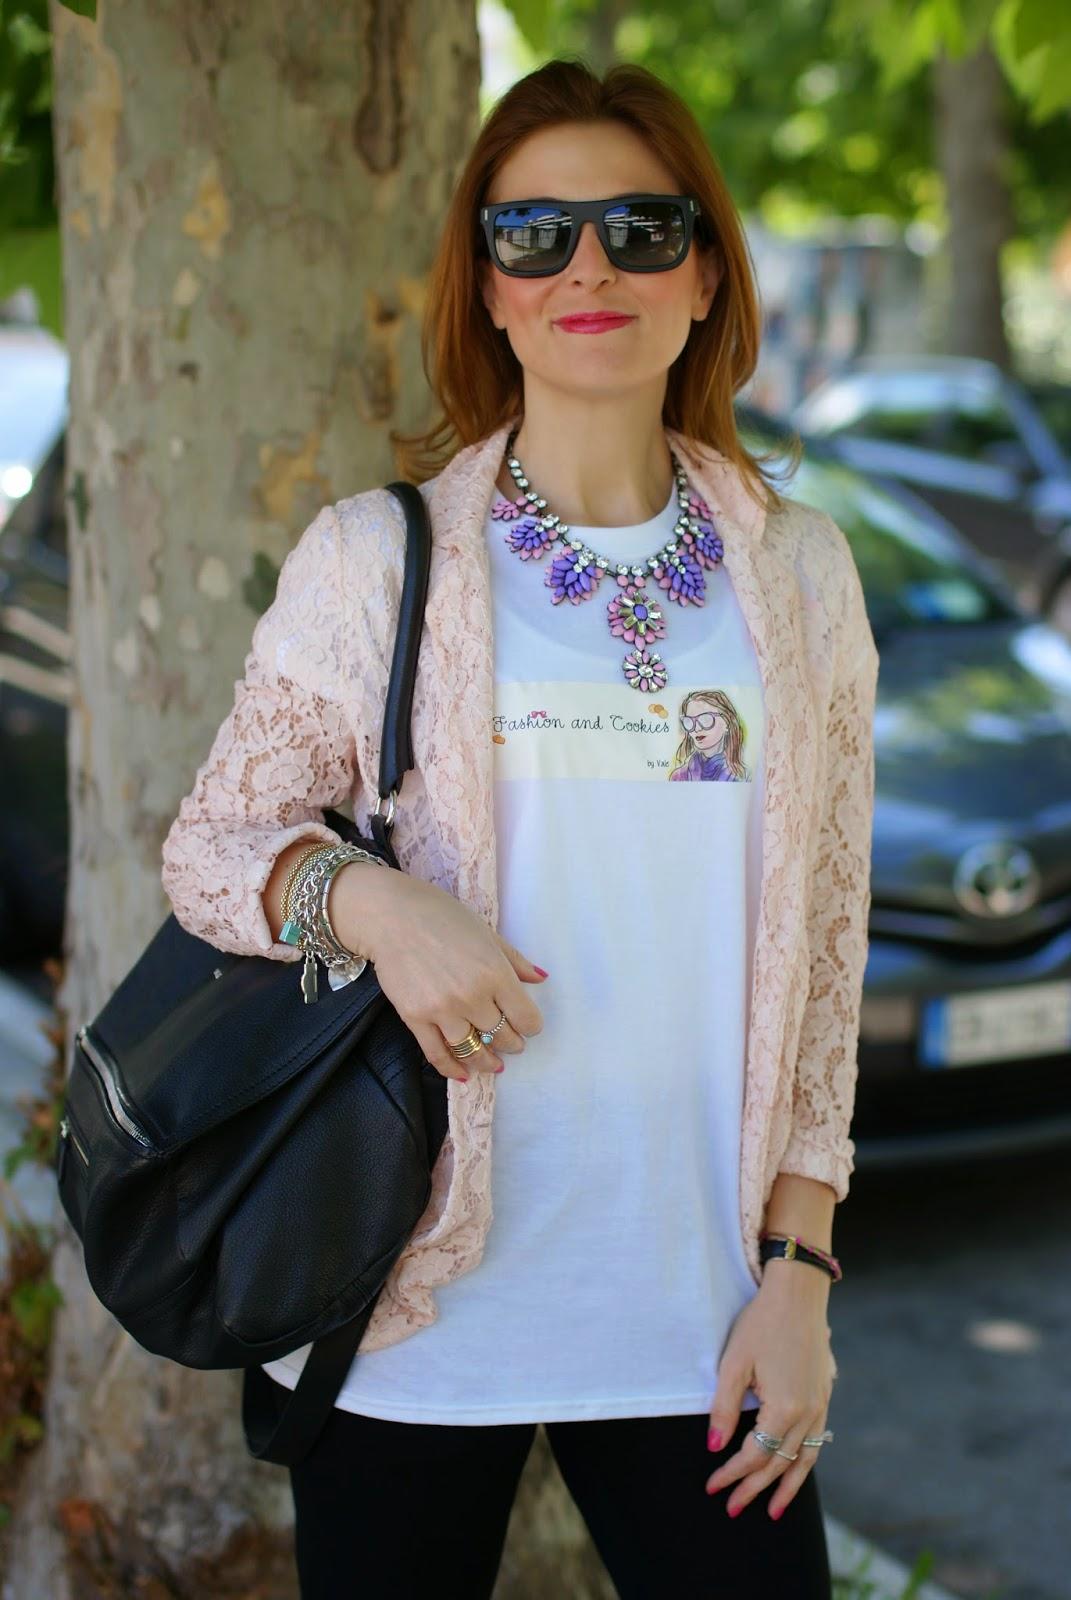 Hicustom review, custom t-shirt, Fashion and Cookies, fashion blogger